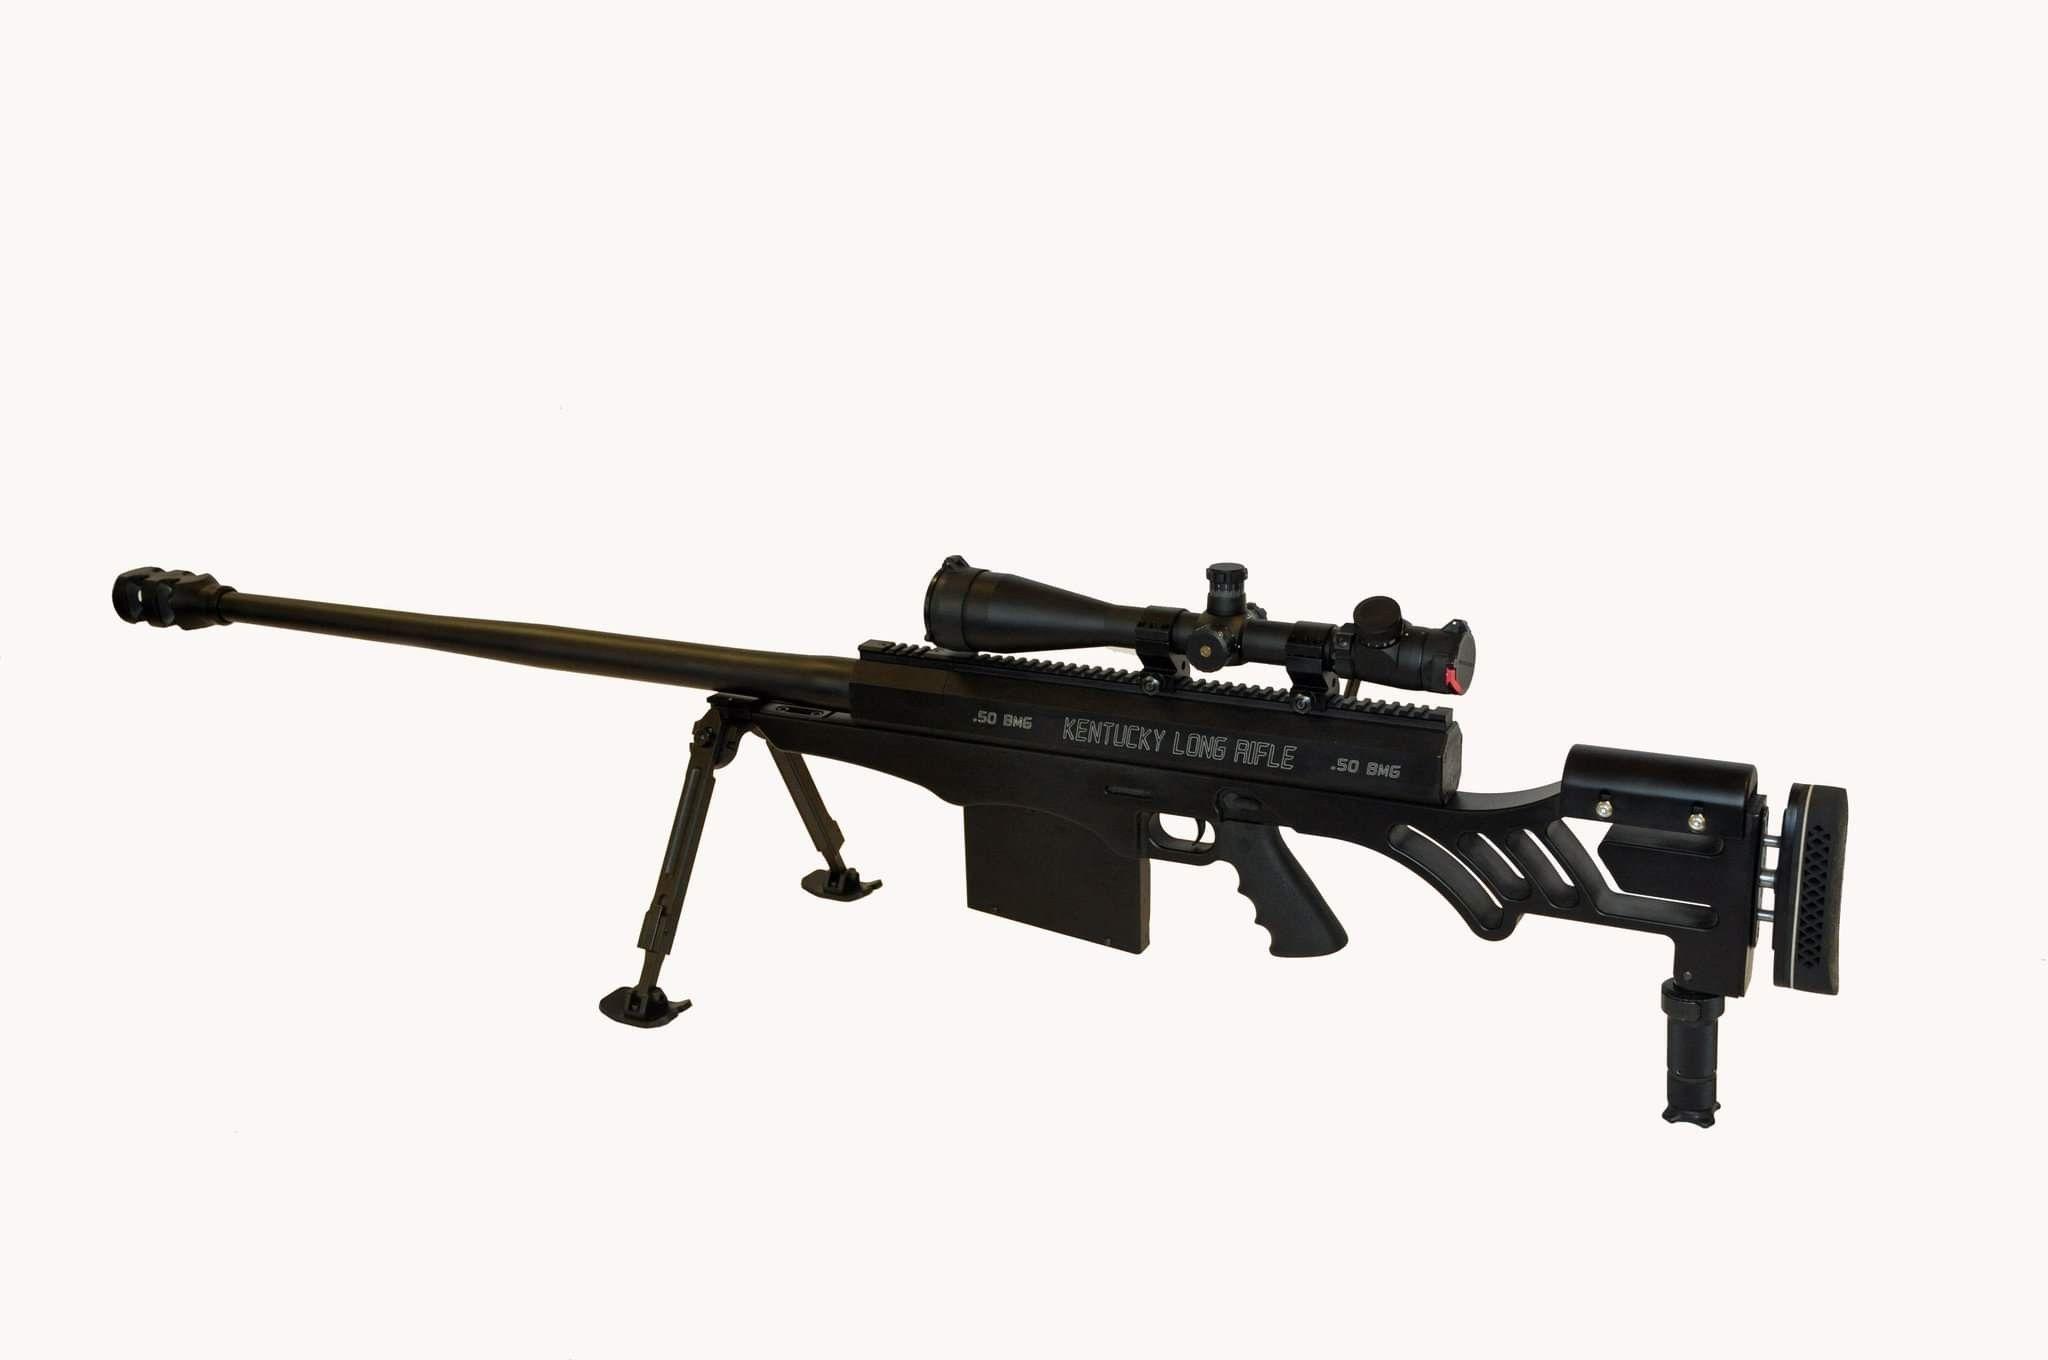 The Kentucky Long Range Rifle 50 BMG, Caliber: 50 BMG